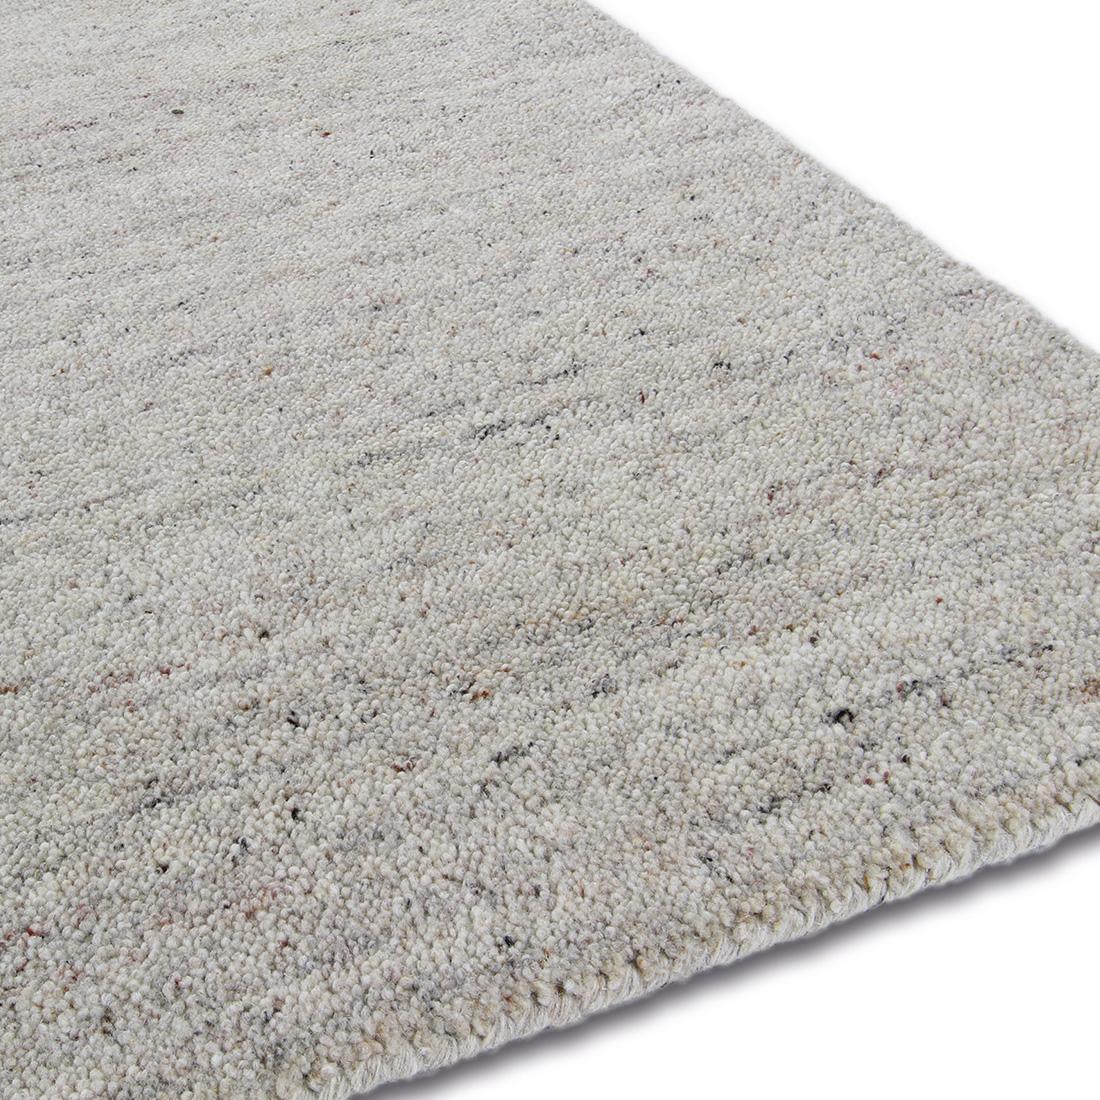 Vloerkleed Brinker Nador Sand | 170 x 230 cm